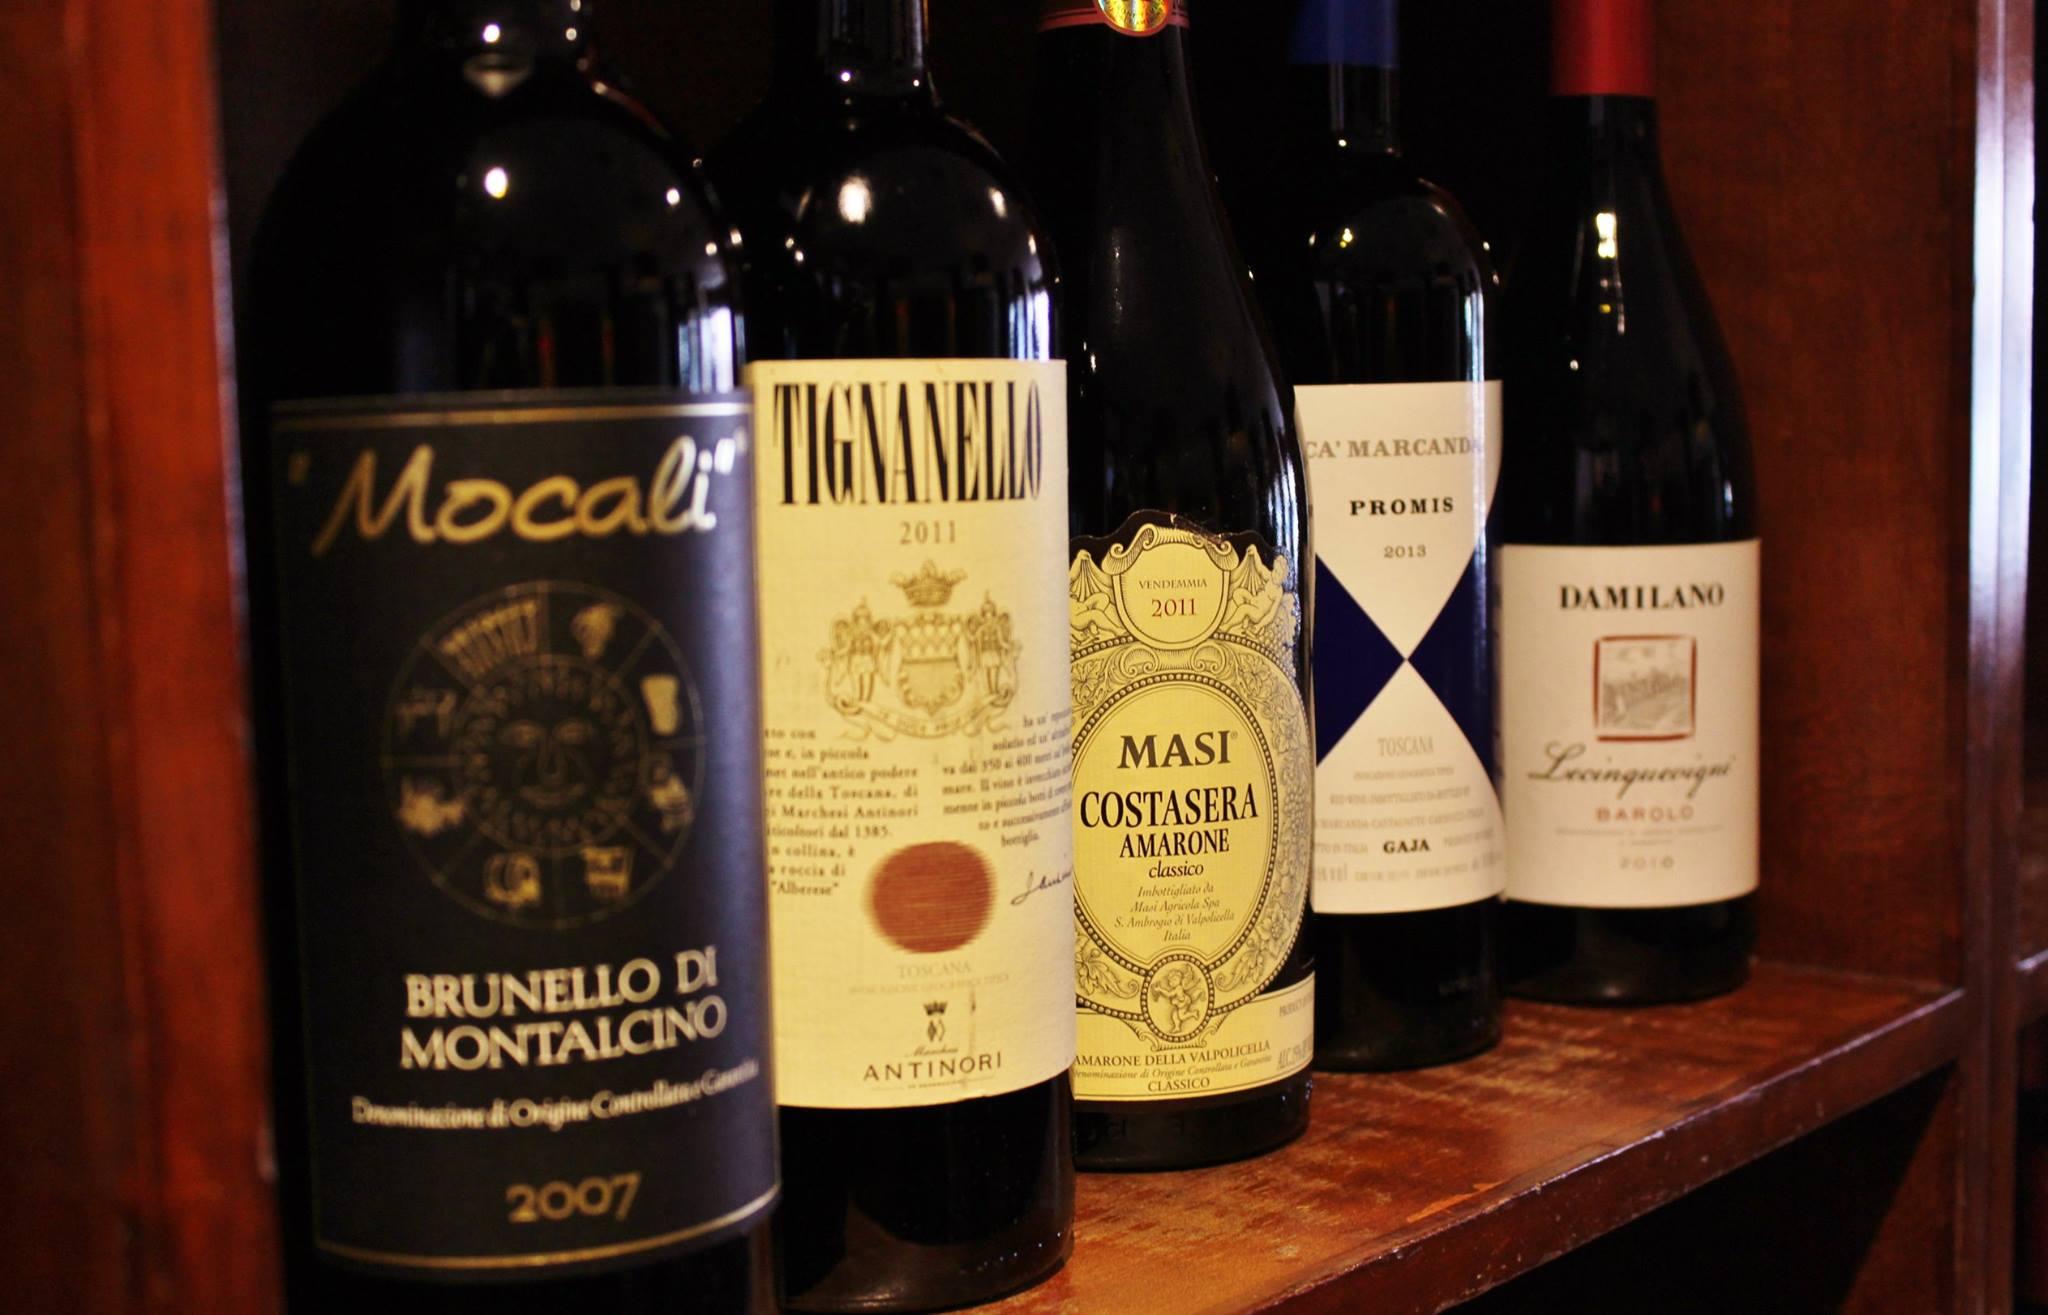 Take 30 percent off bottles of wine at Jonathan's Ristorante on Sundays and Thursdays.